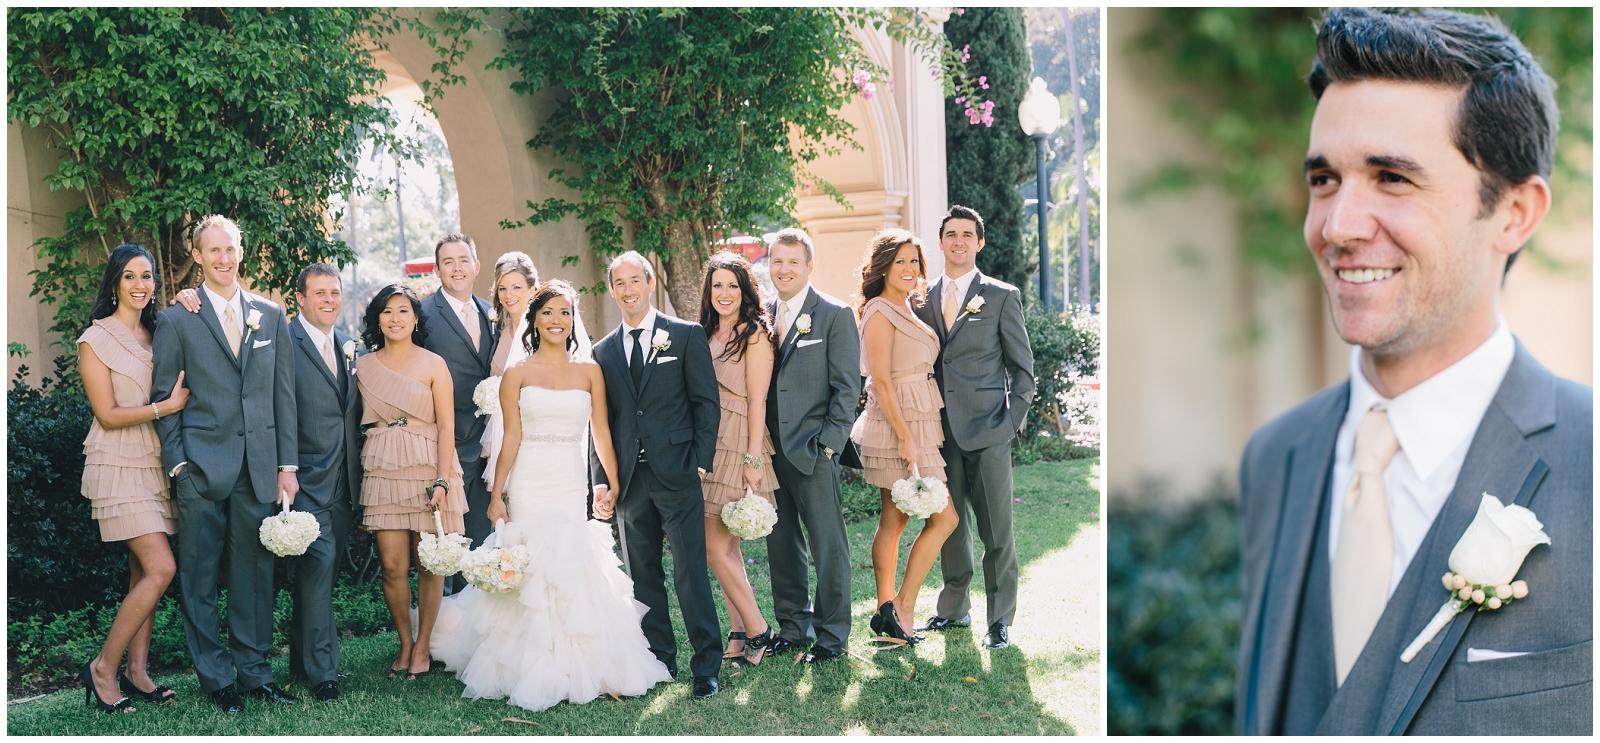 San-Francisco-Bay-Area-Wedding-Photography-Destination-17.jpg